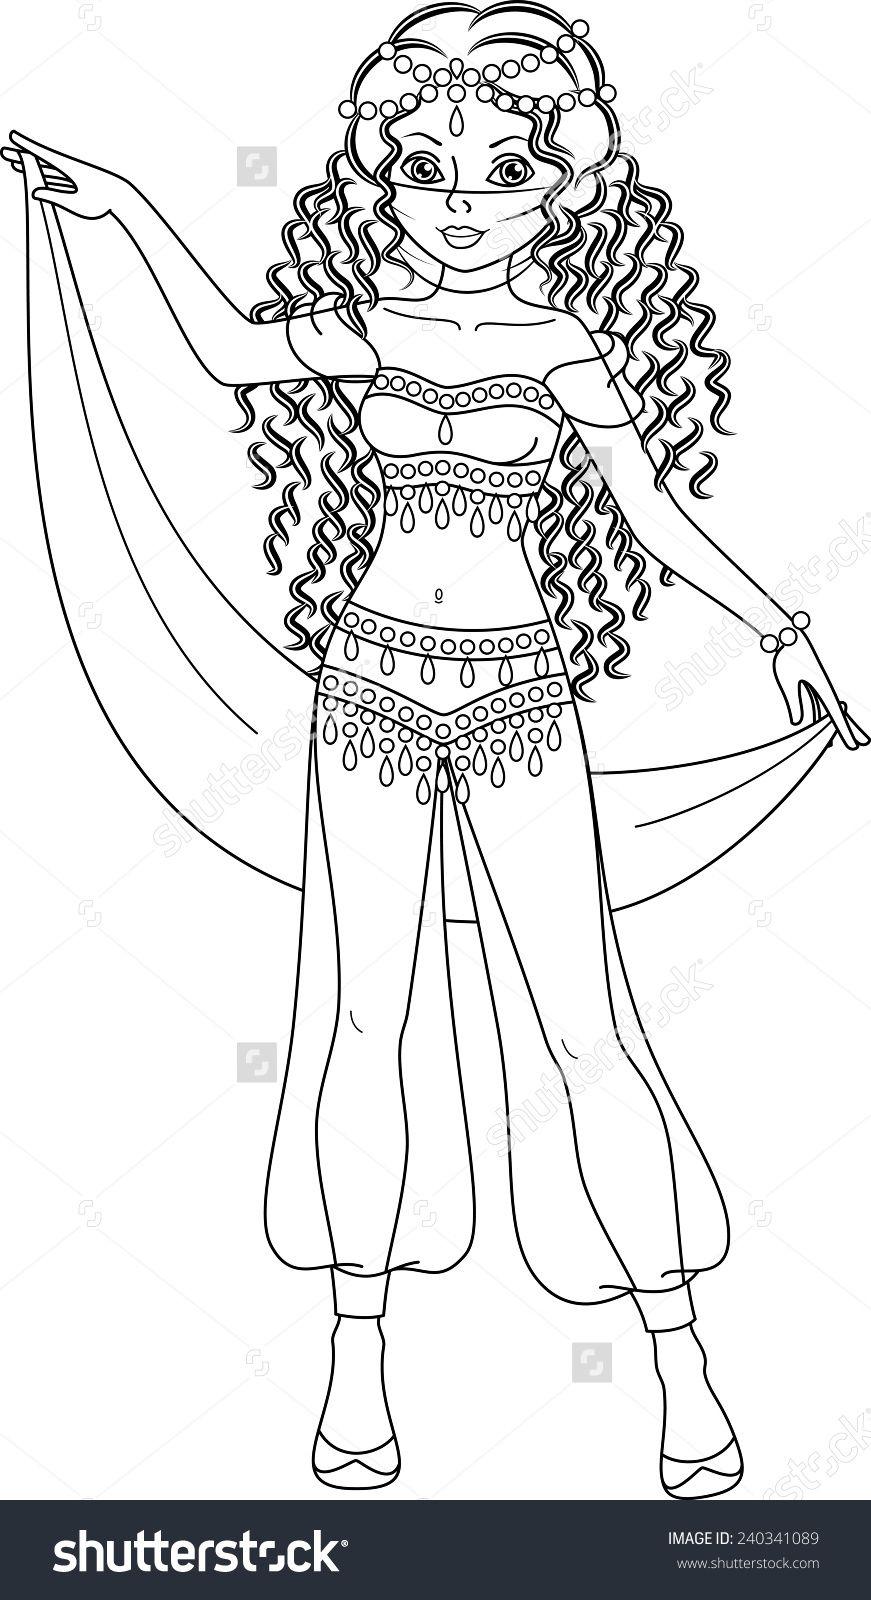 Princess Coloring Page Stock Vector Illustration 240341089 Shutterstock Princess Coloring Pages Princess Coloring Coloring Pages